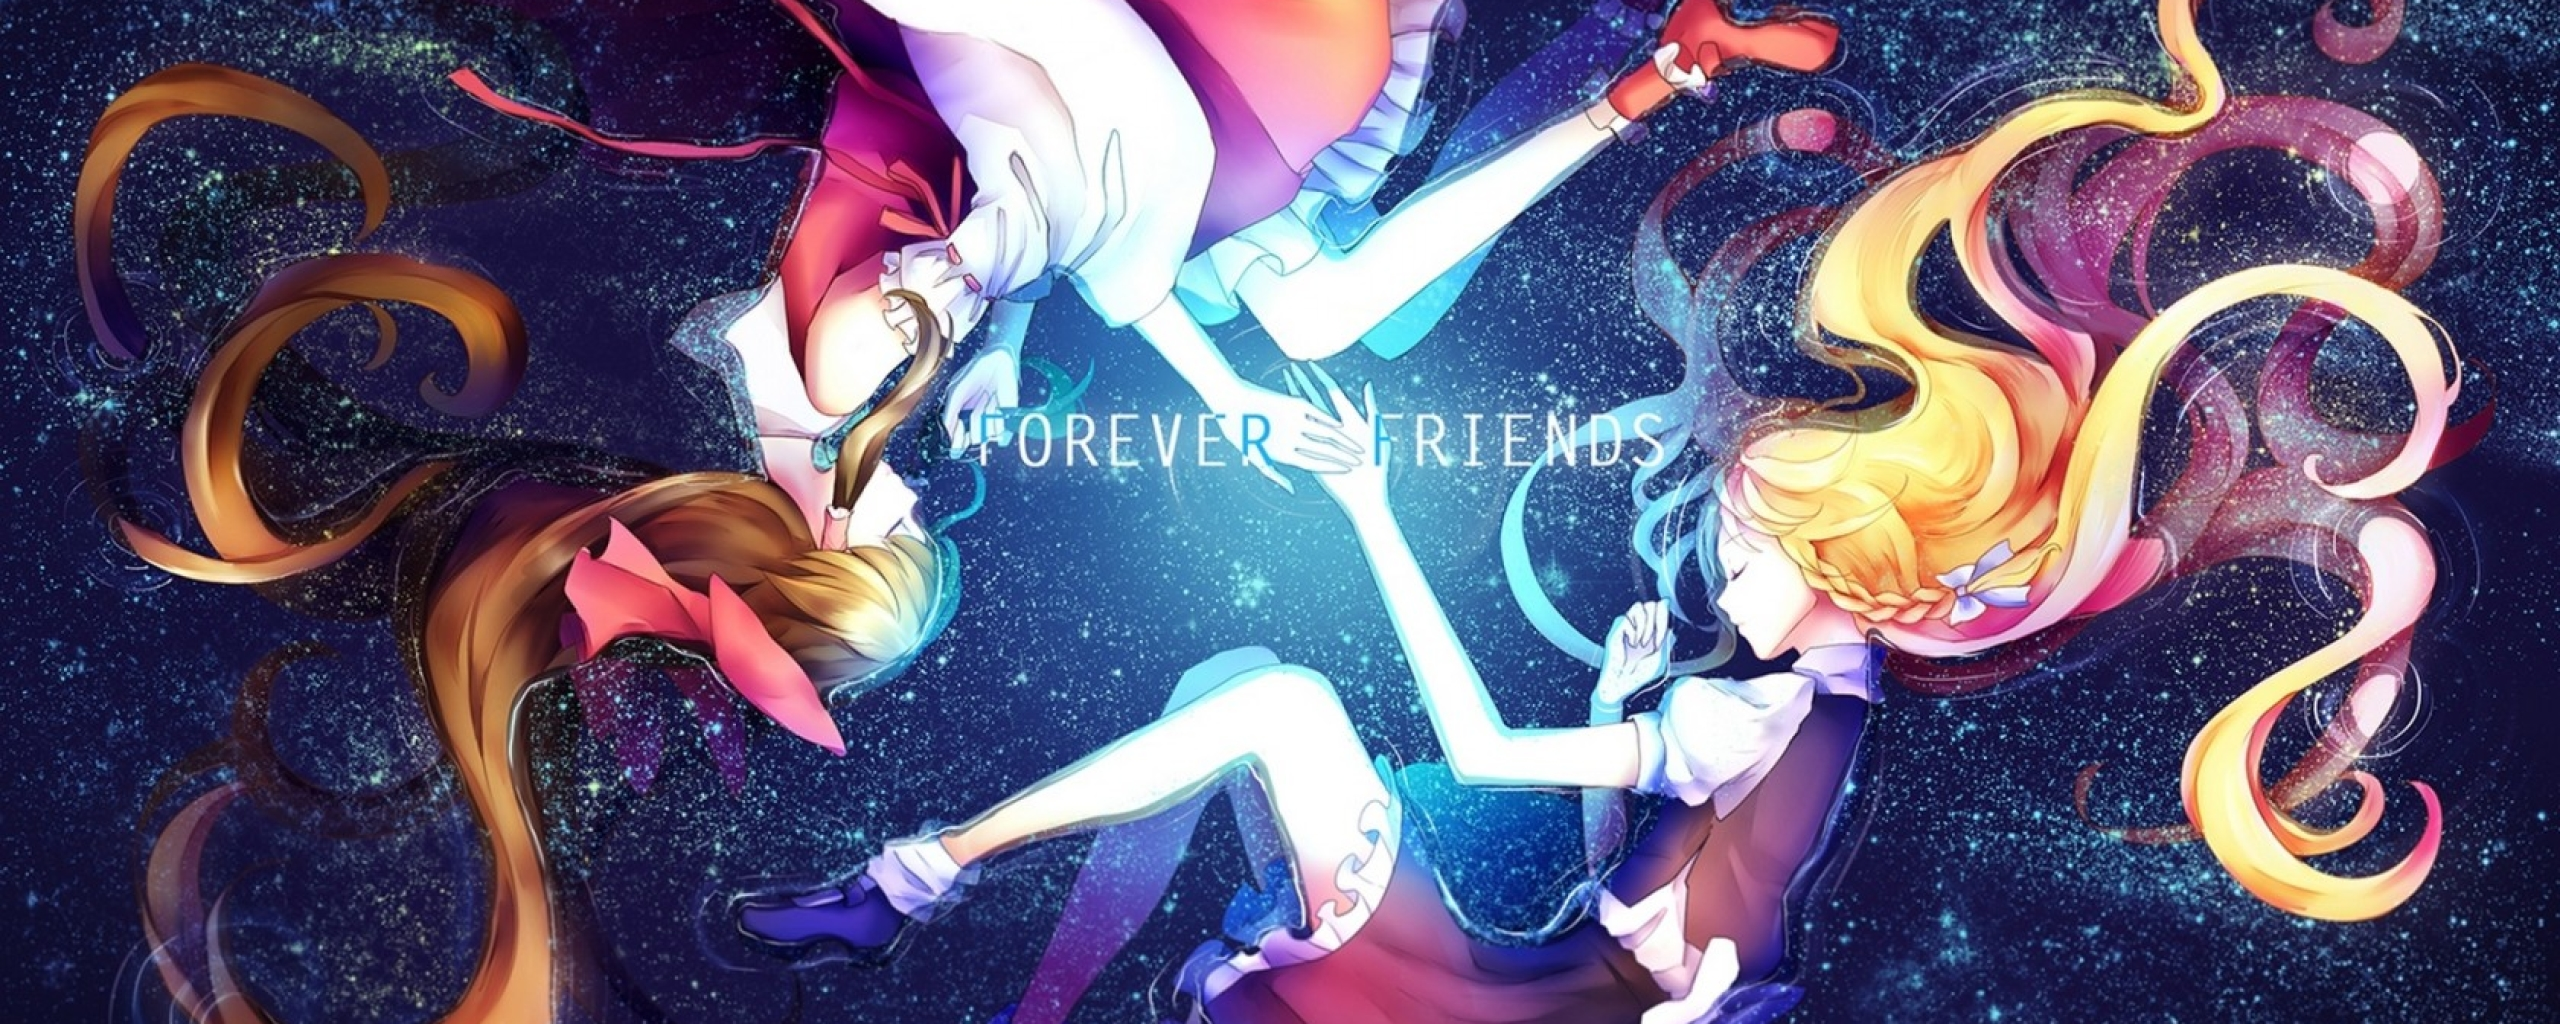 2560x1024 Vivianling Touhou Hakurei Reimu 2560x1024 Resolution Wallpaper Hd Anime 4k Wallpapers Images Photos And Background